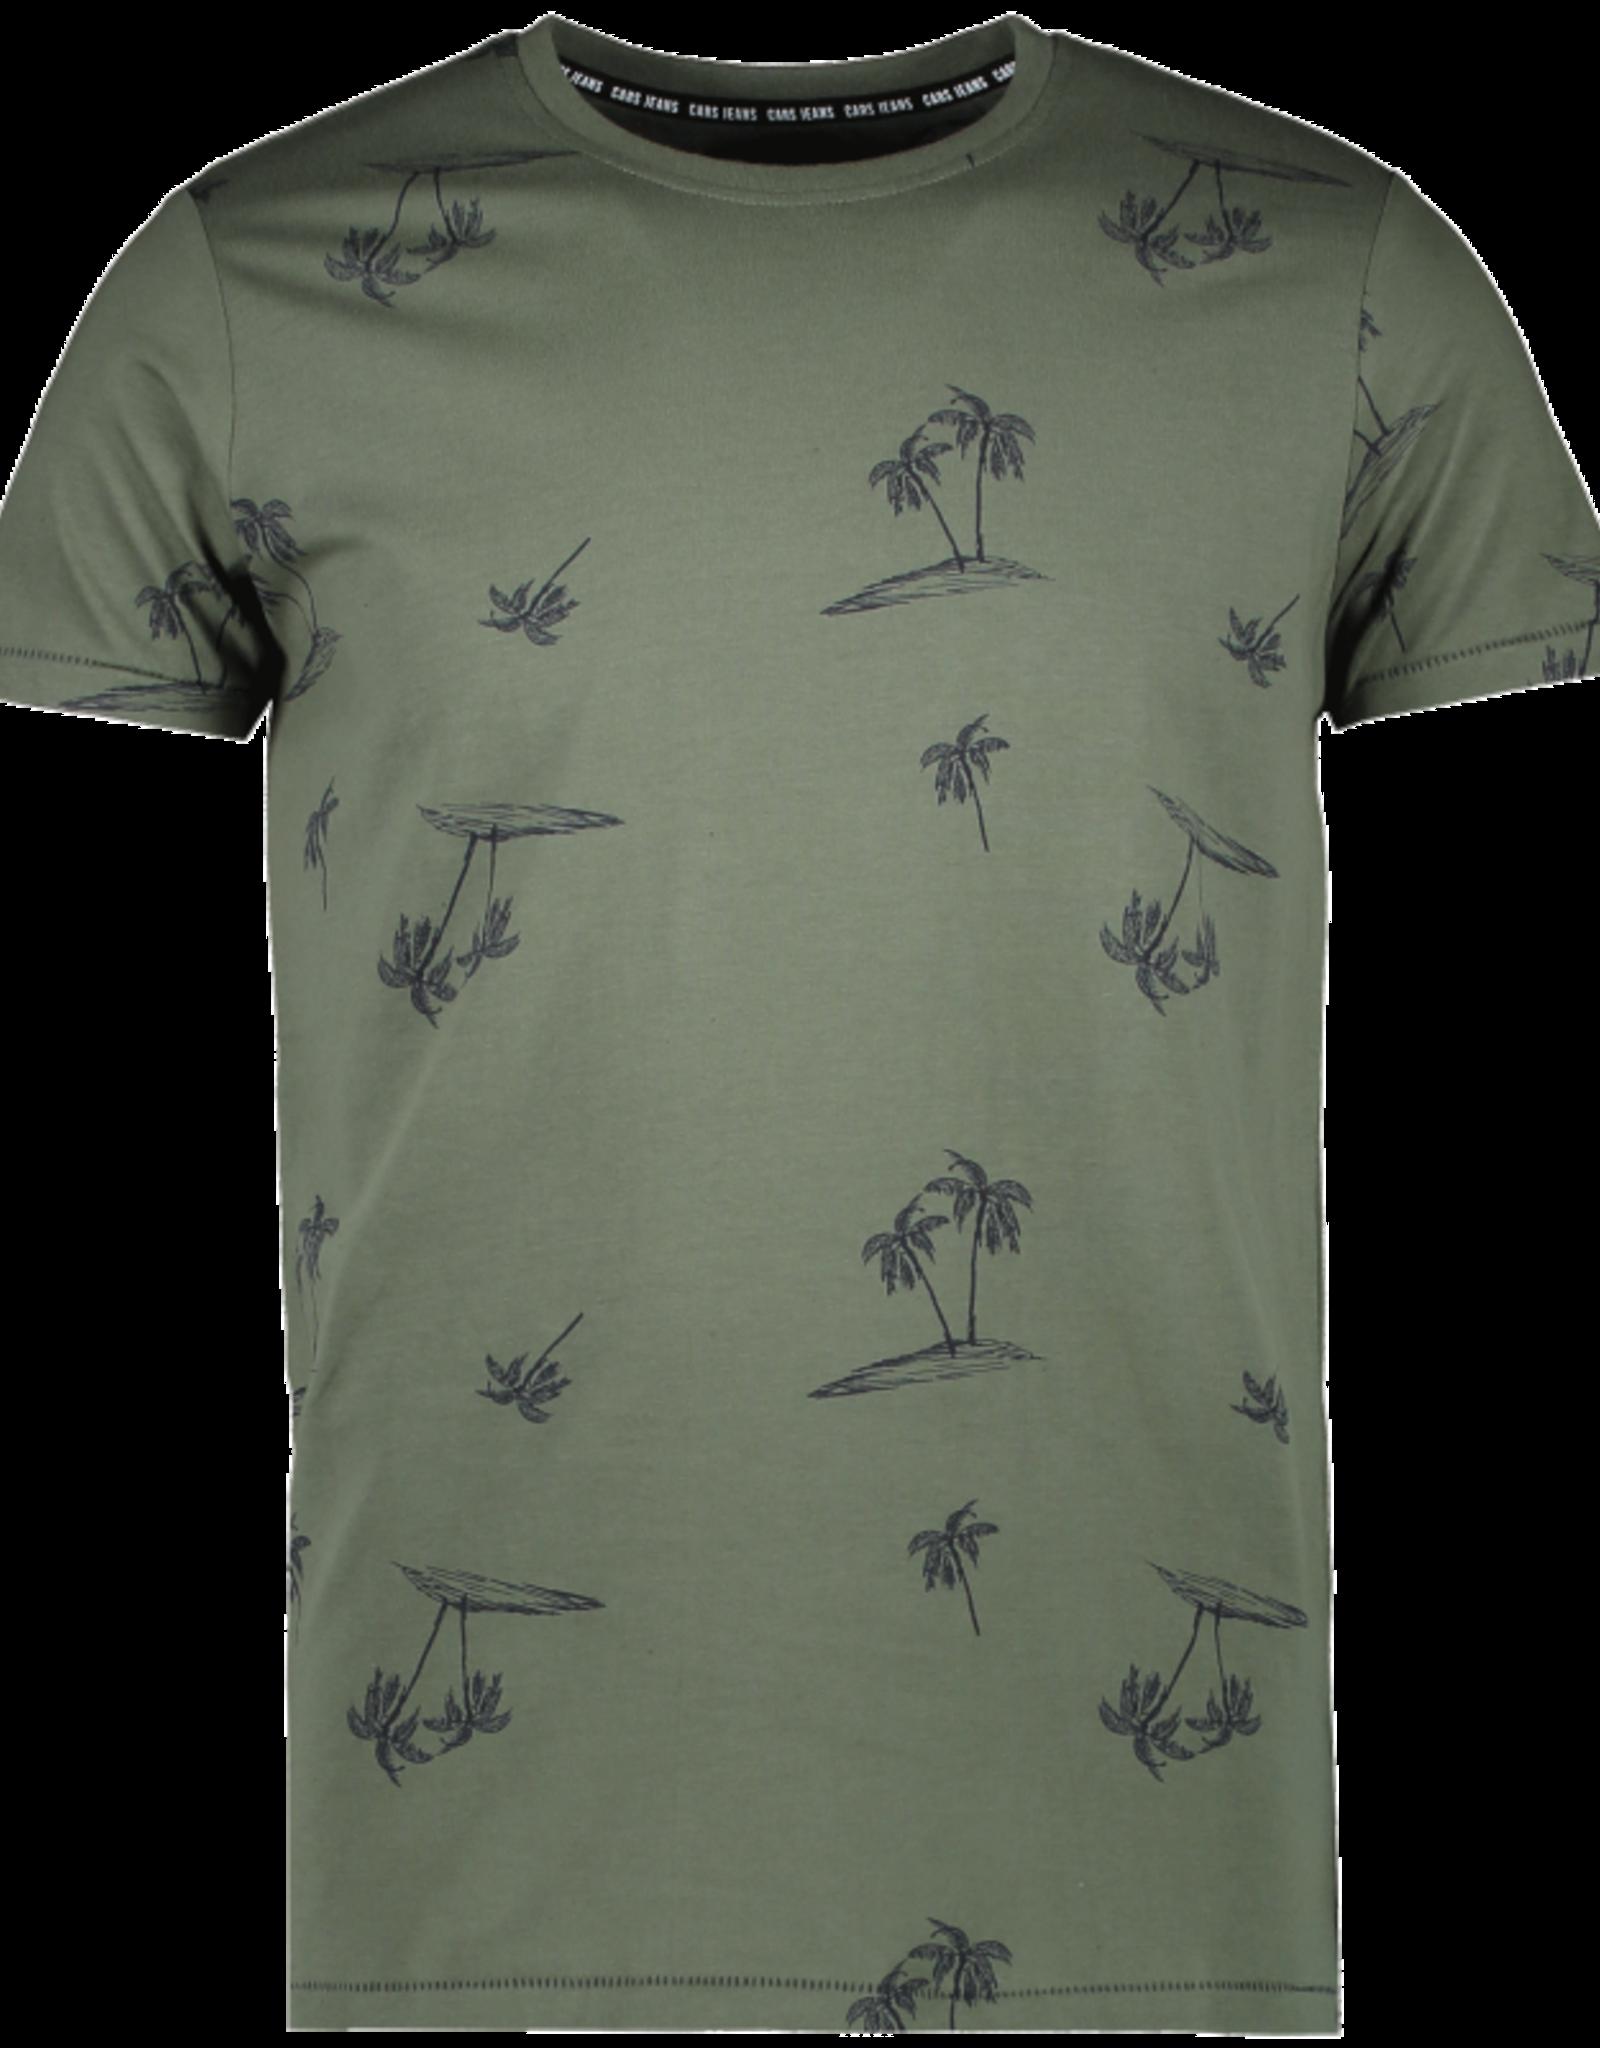 Cars Cars Ruther army groen t-shirt met palmbomenprint